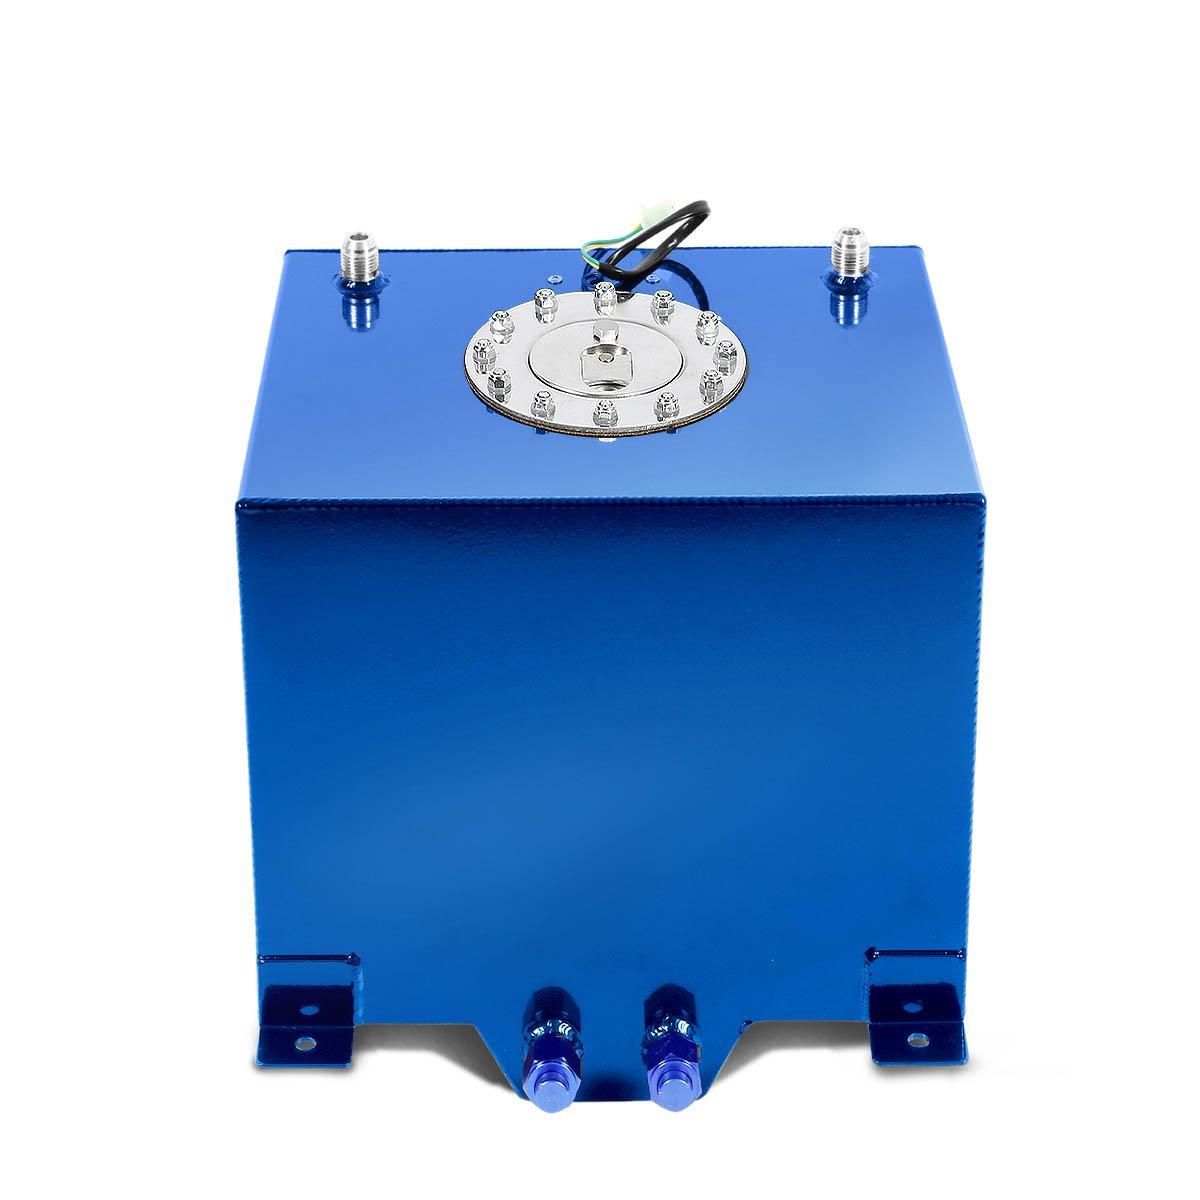 DNAMotoring ALU-FT-T2-ALU-RD Aluminum 5-Gallon Fuel Cell Gas Tank